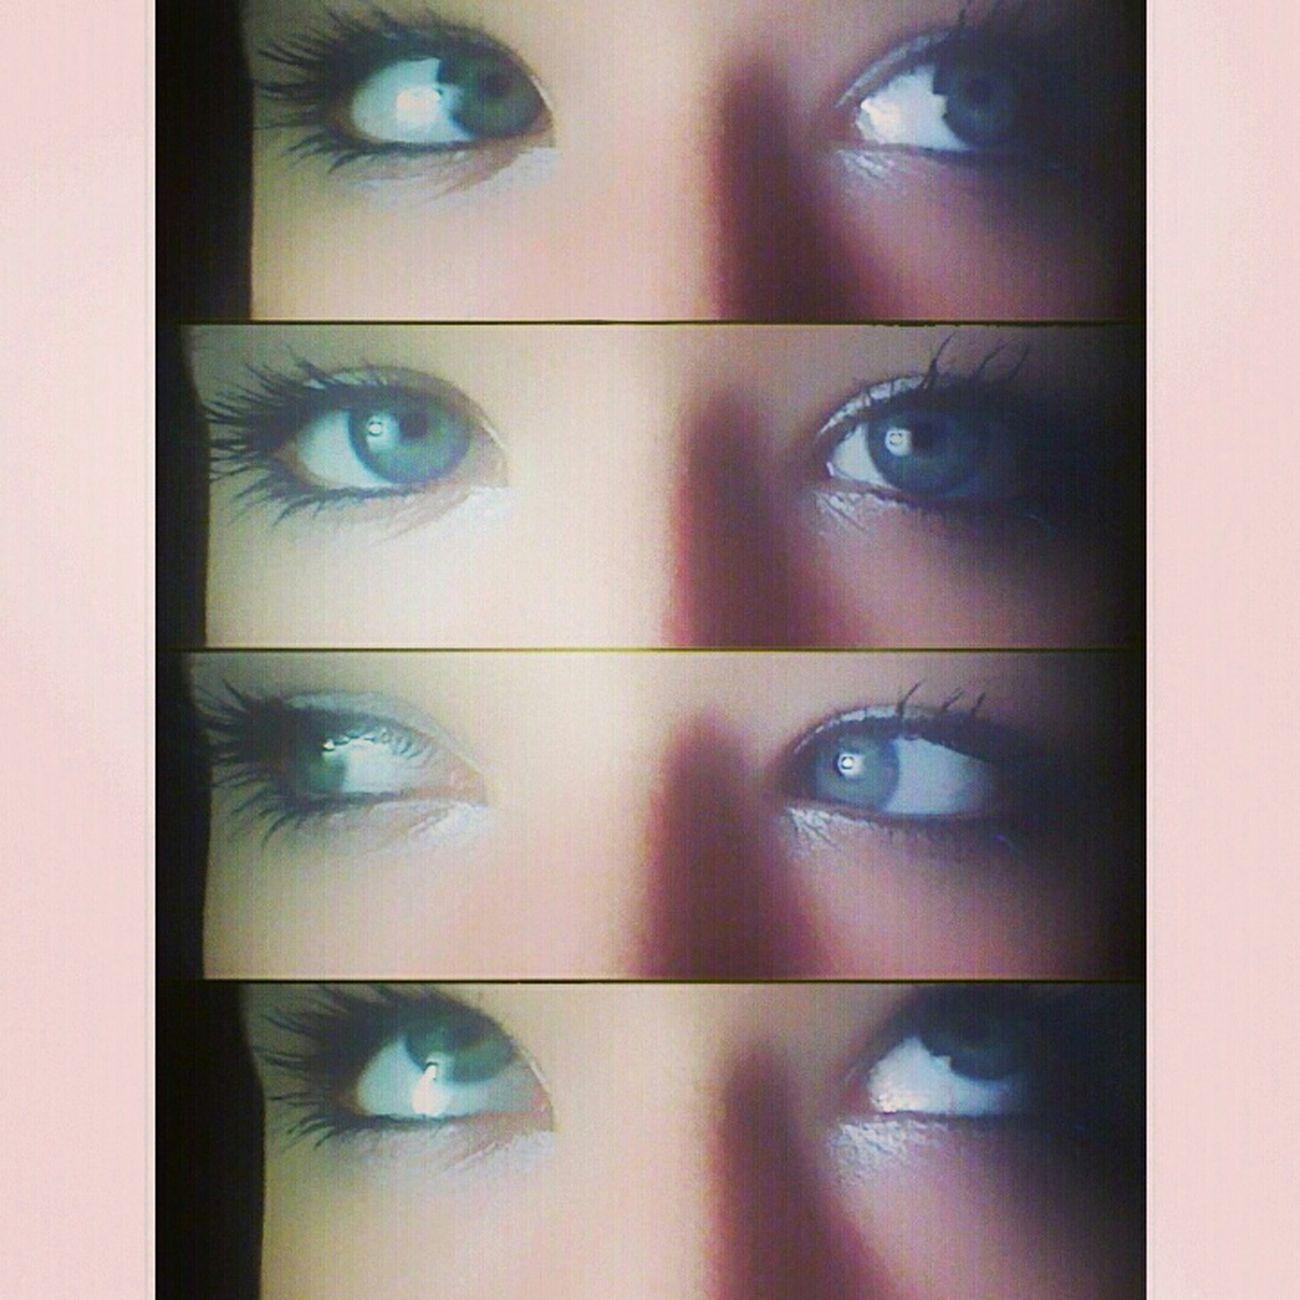 me eyes (: